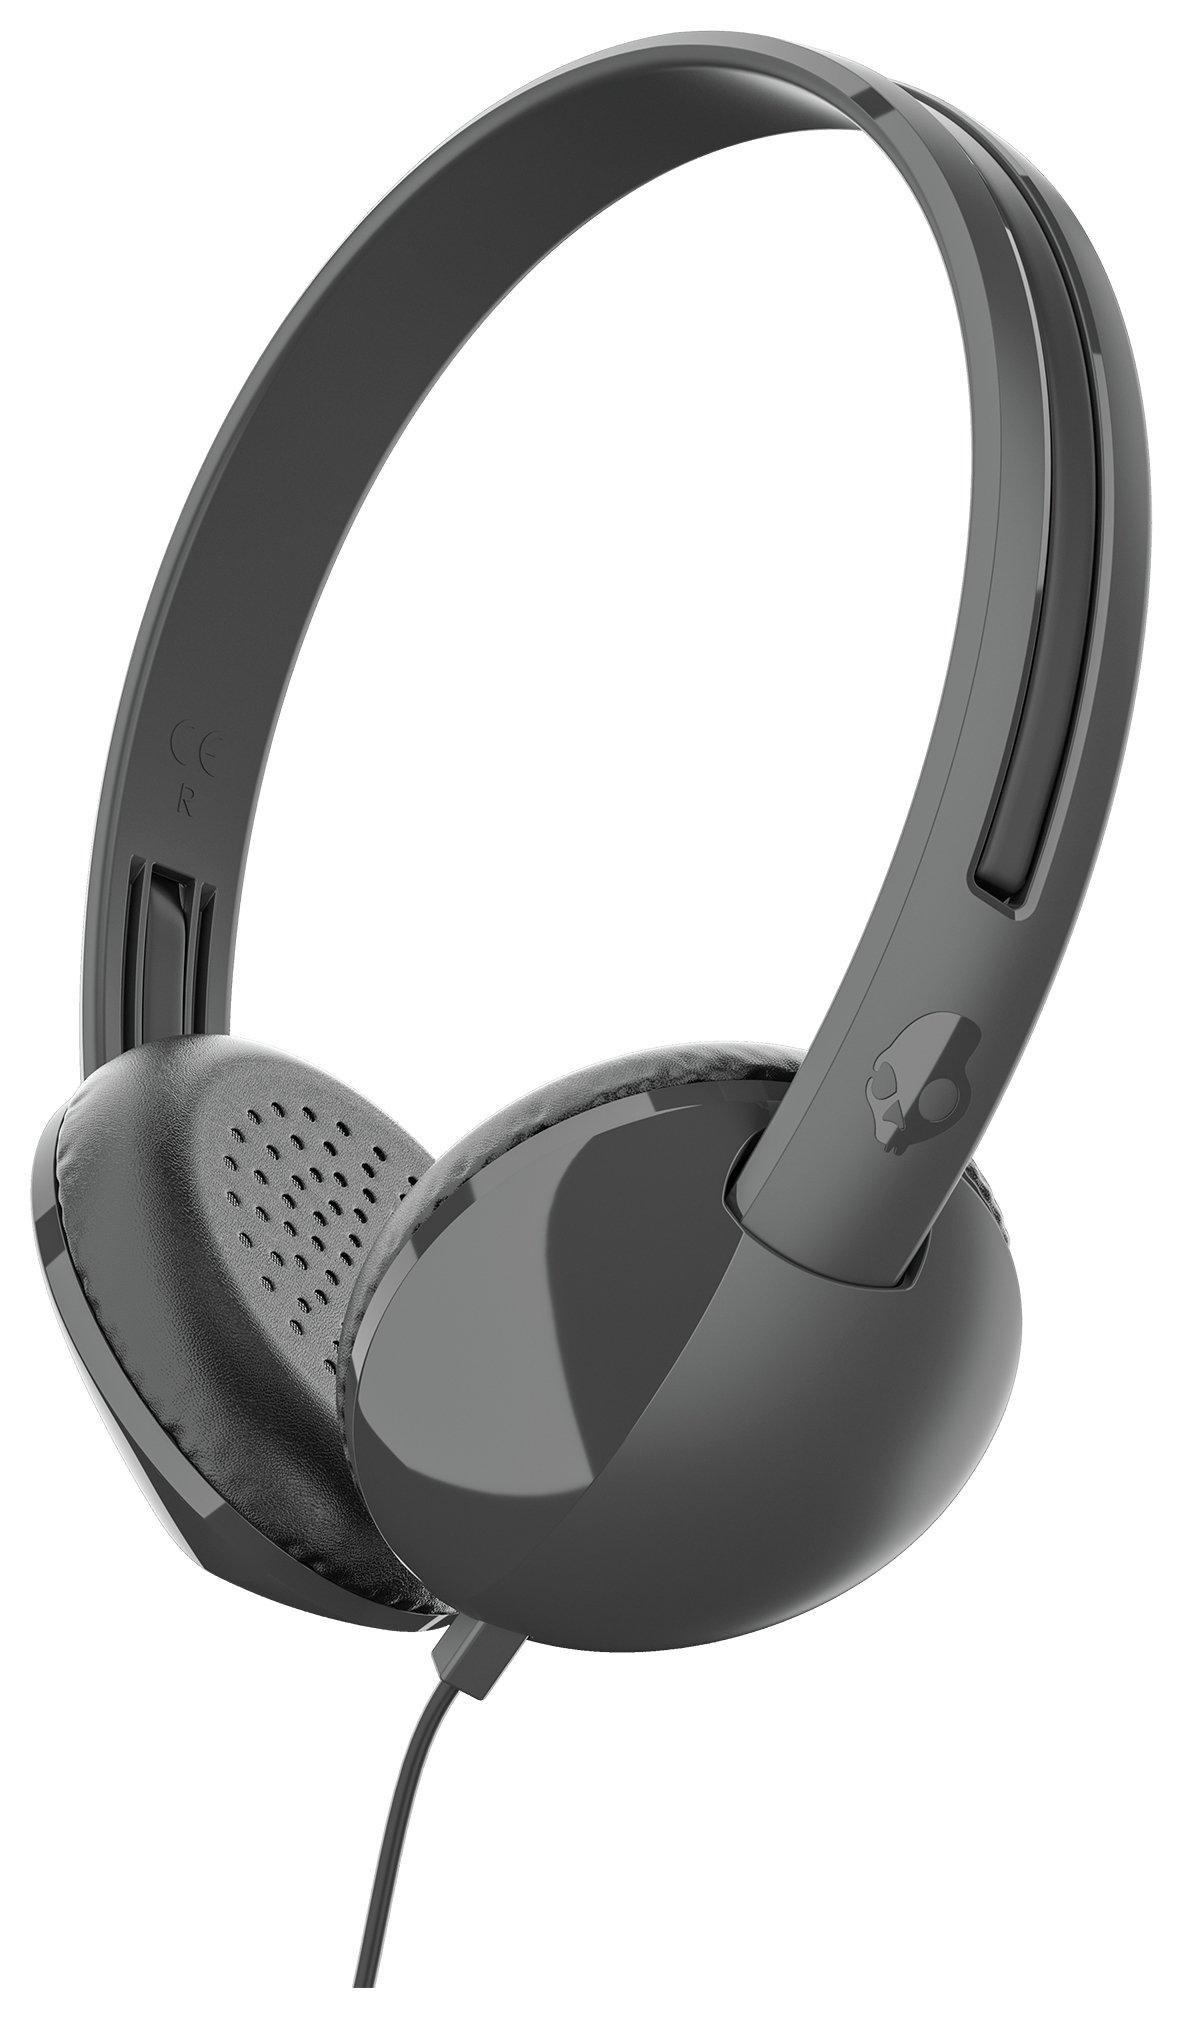 Skullcandy Stim On-Ear Headphones - Black